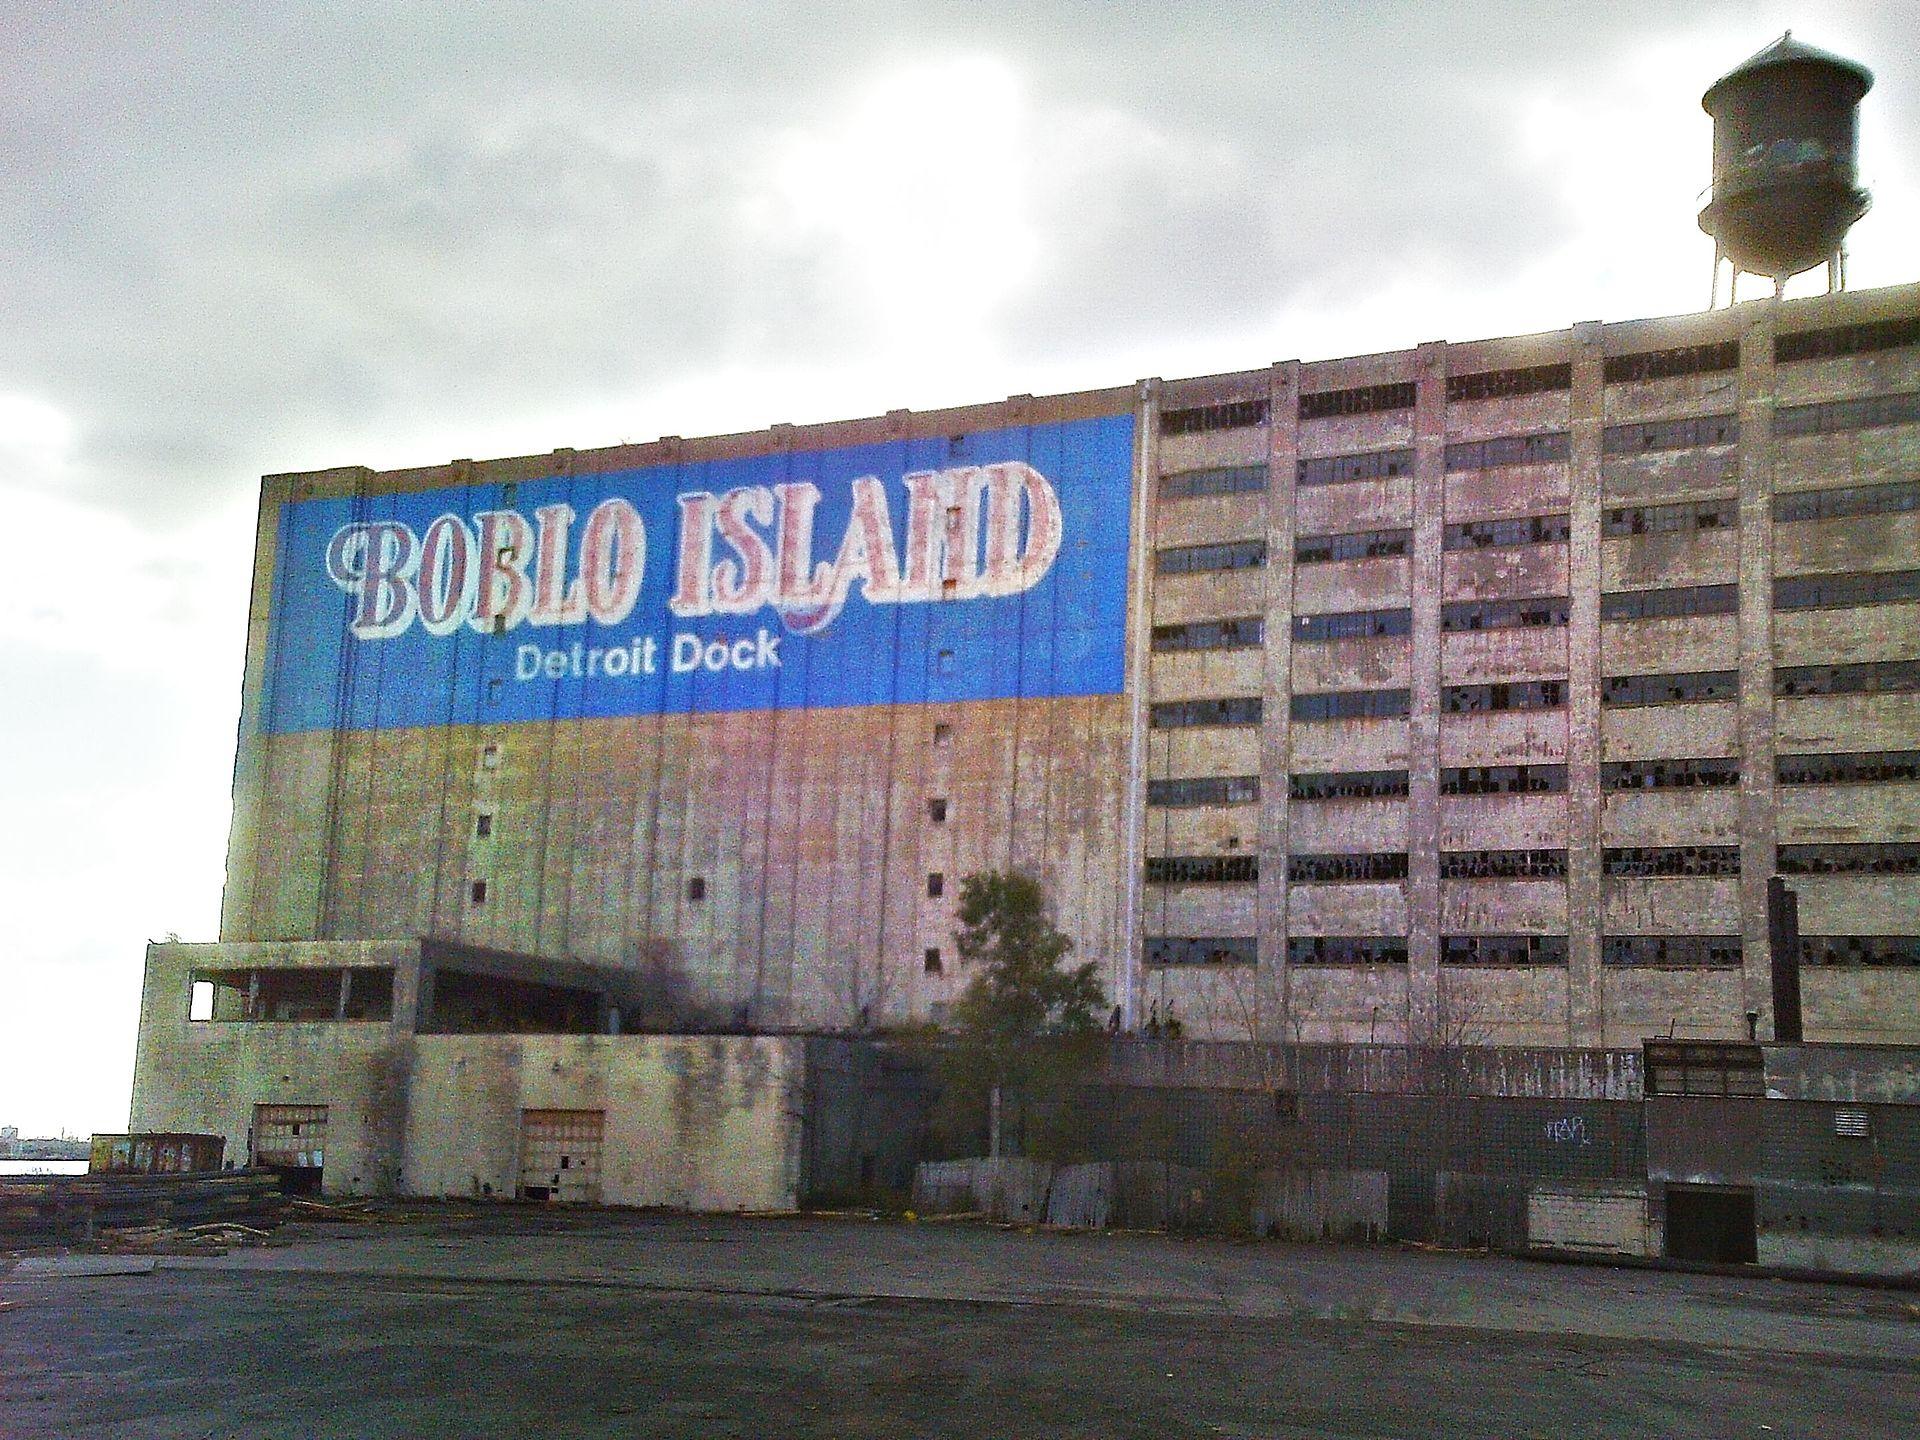 Detroit Harbor Terminals Boblo Island Detroit Dock